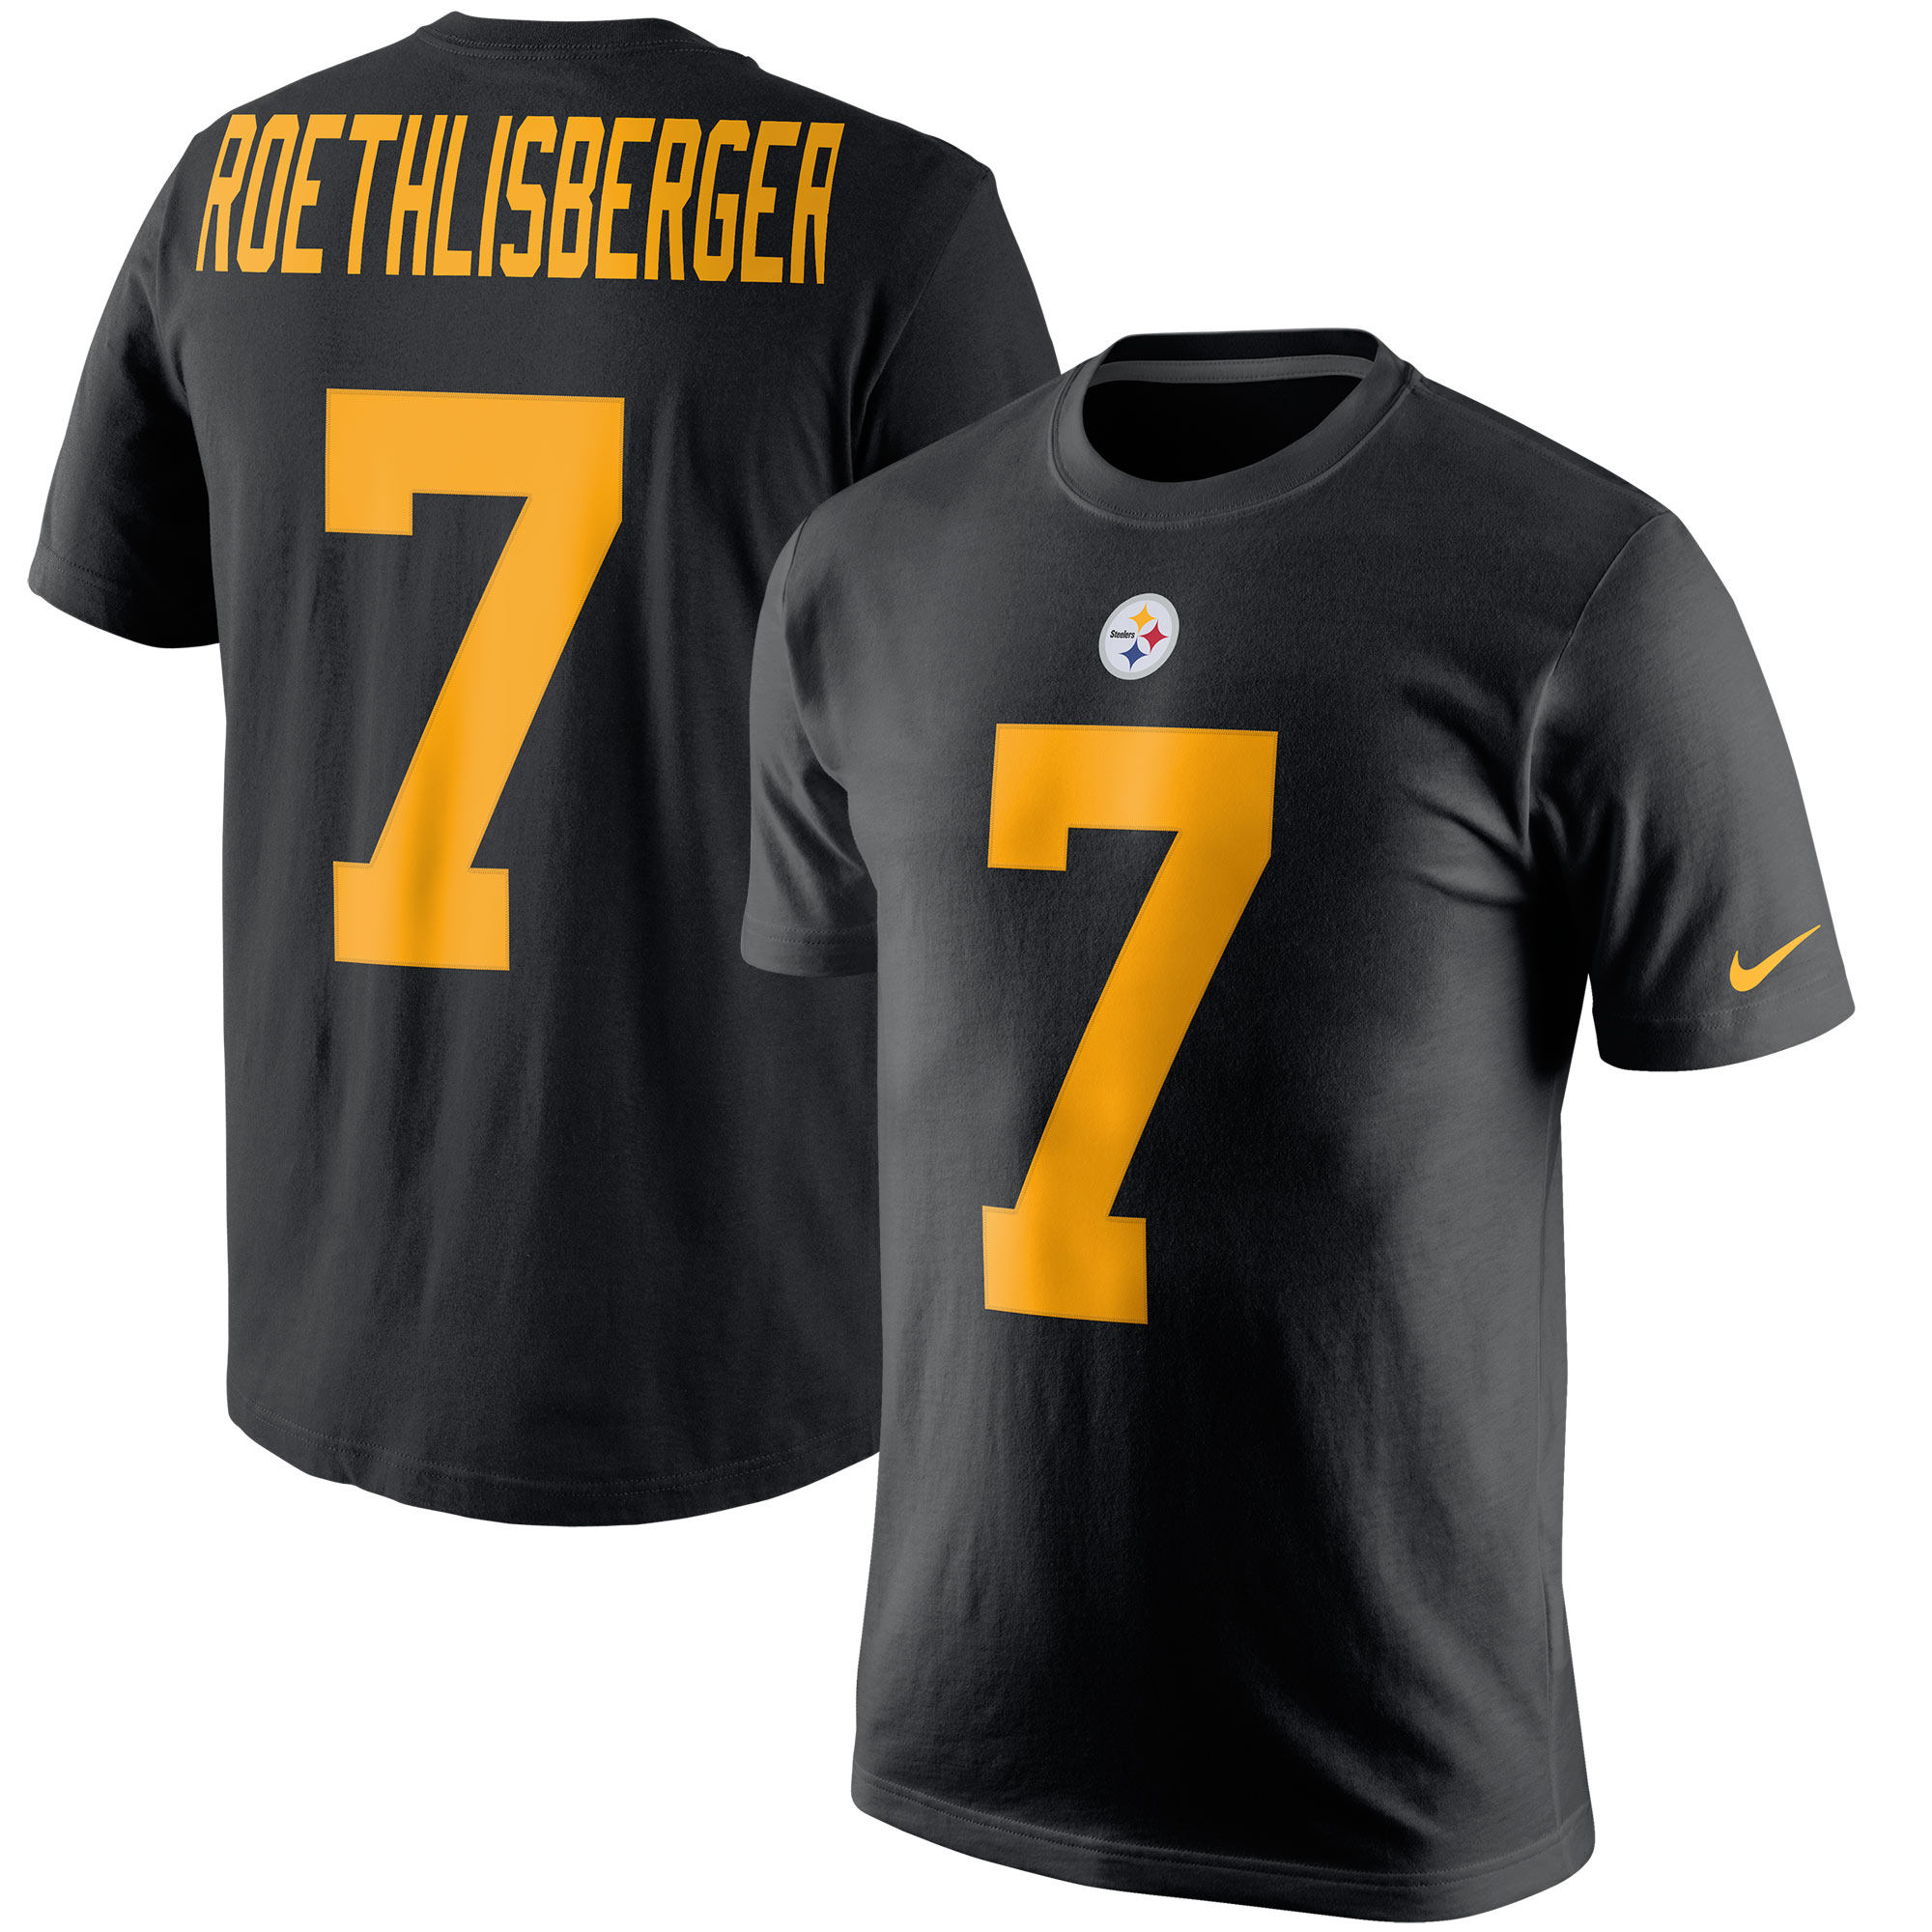 Ben Roethlisberger Pittsburgh Steelers Nike Color Rush Player Pride Name & Number T-Shirt - Black